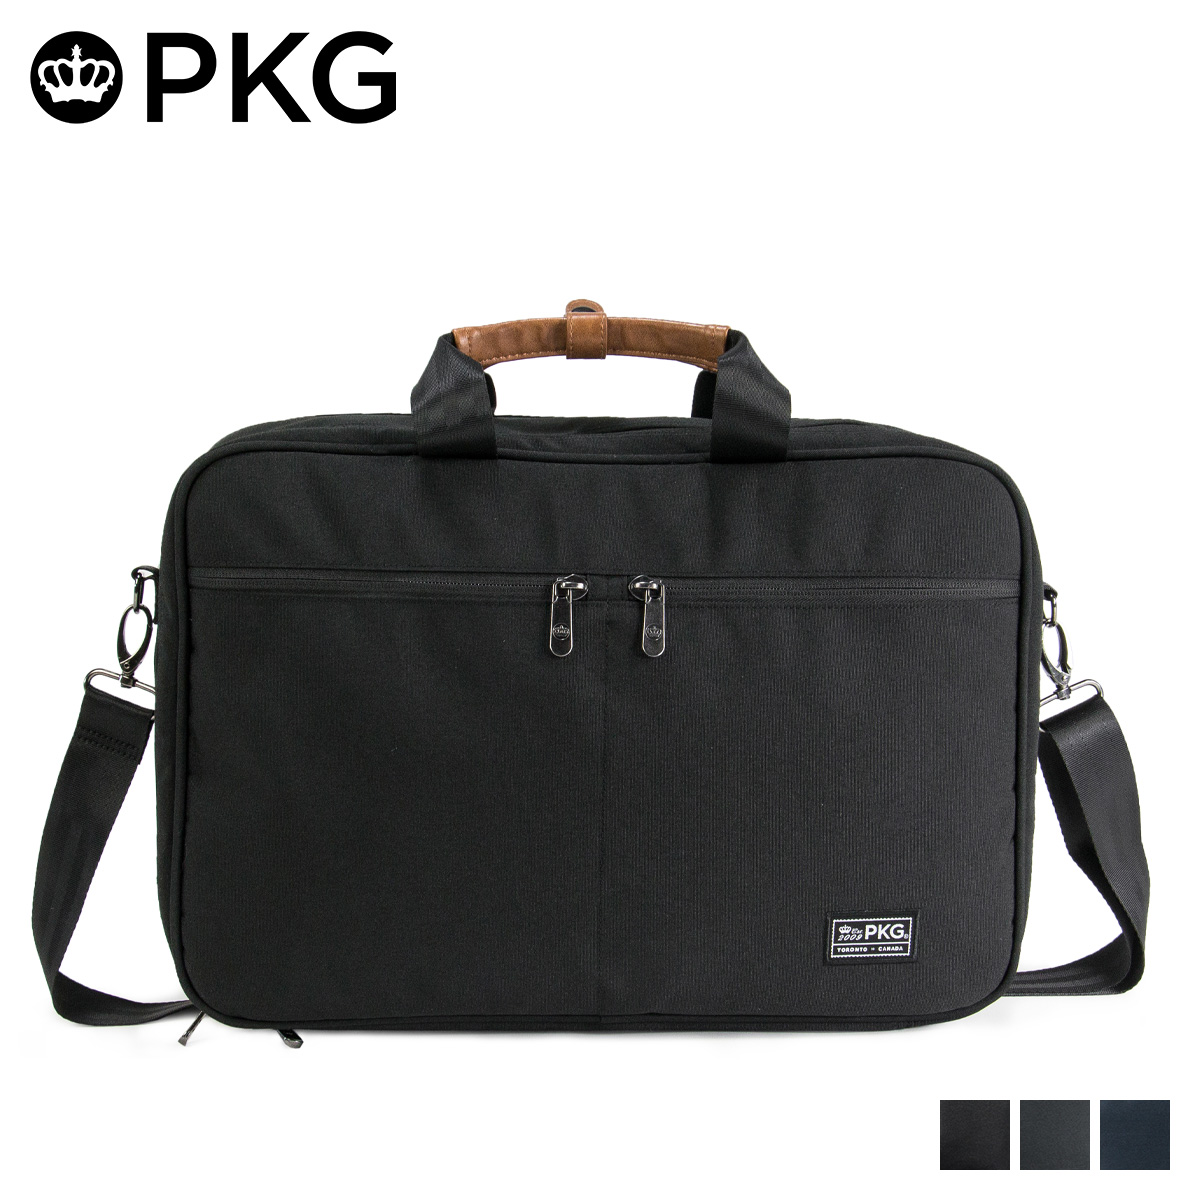 PKG PEARSON ピーケージー バッグ リュック ショルダーバッグ メンズ レディース 3WAY 20L ブラック チャコールグレー ネイビー 黒 19PE